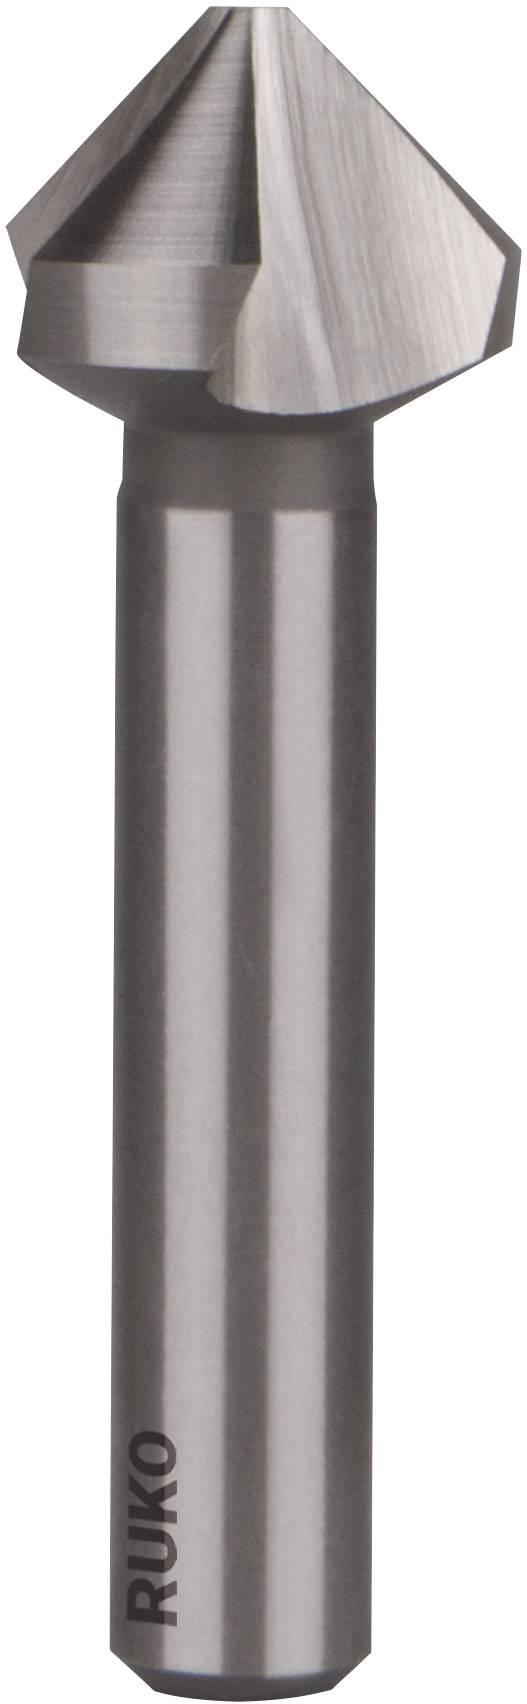 Bosch Kegelsenker Werkzeugstahl